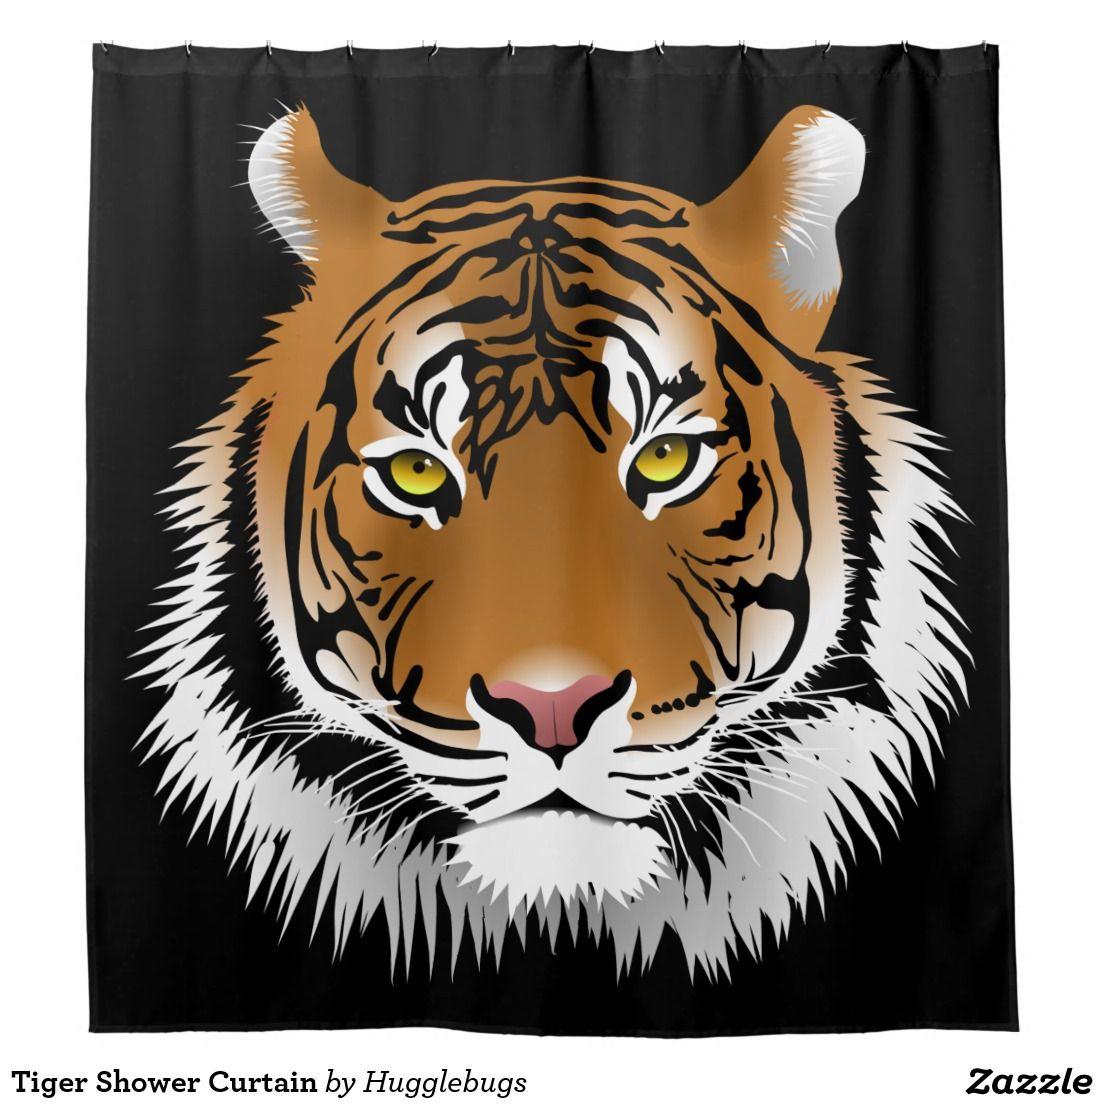 Tiger Shower Curtain Zazzle Com Tiger Illustration Tiger Face